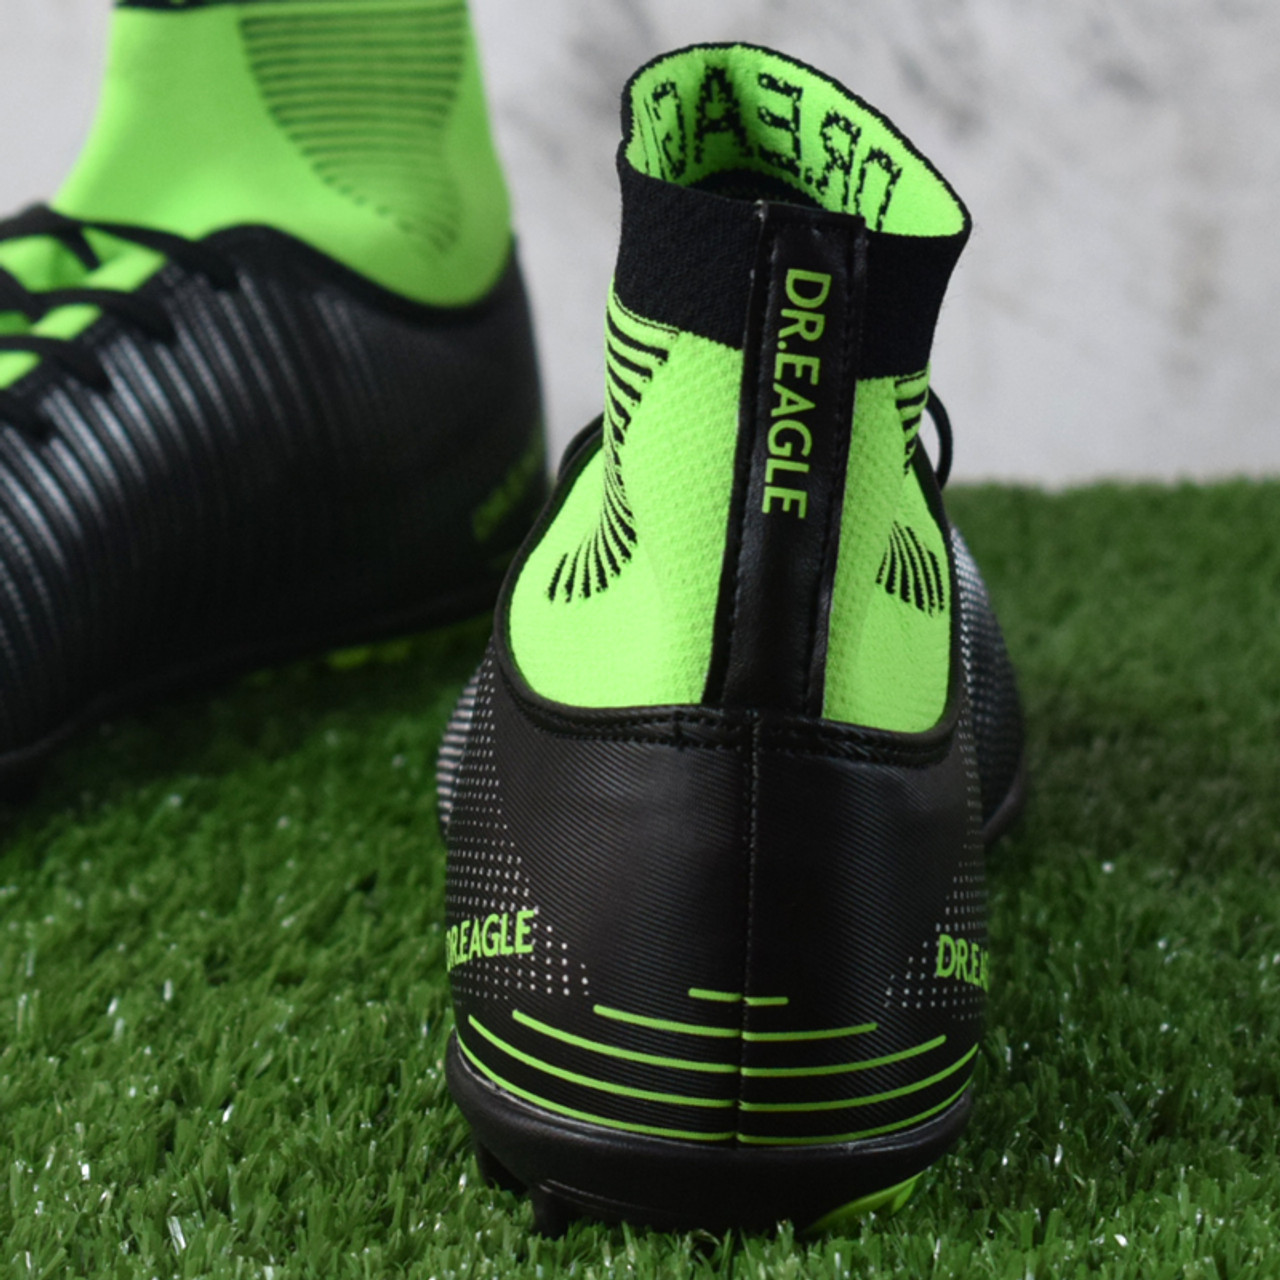 e2e9a215f EAGLE TF  turf Indoor high ankle soccer cleats football shoes futsal  Footballs Sock ...